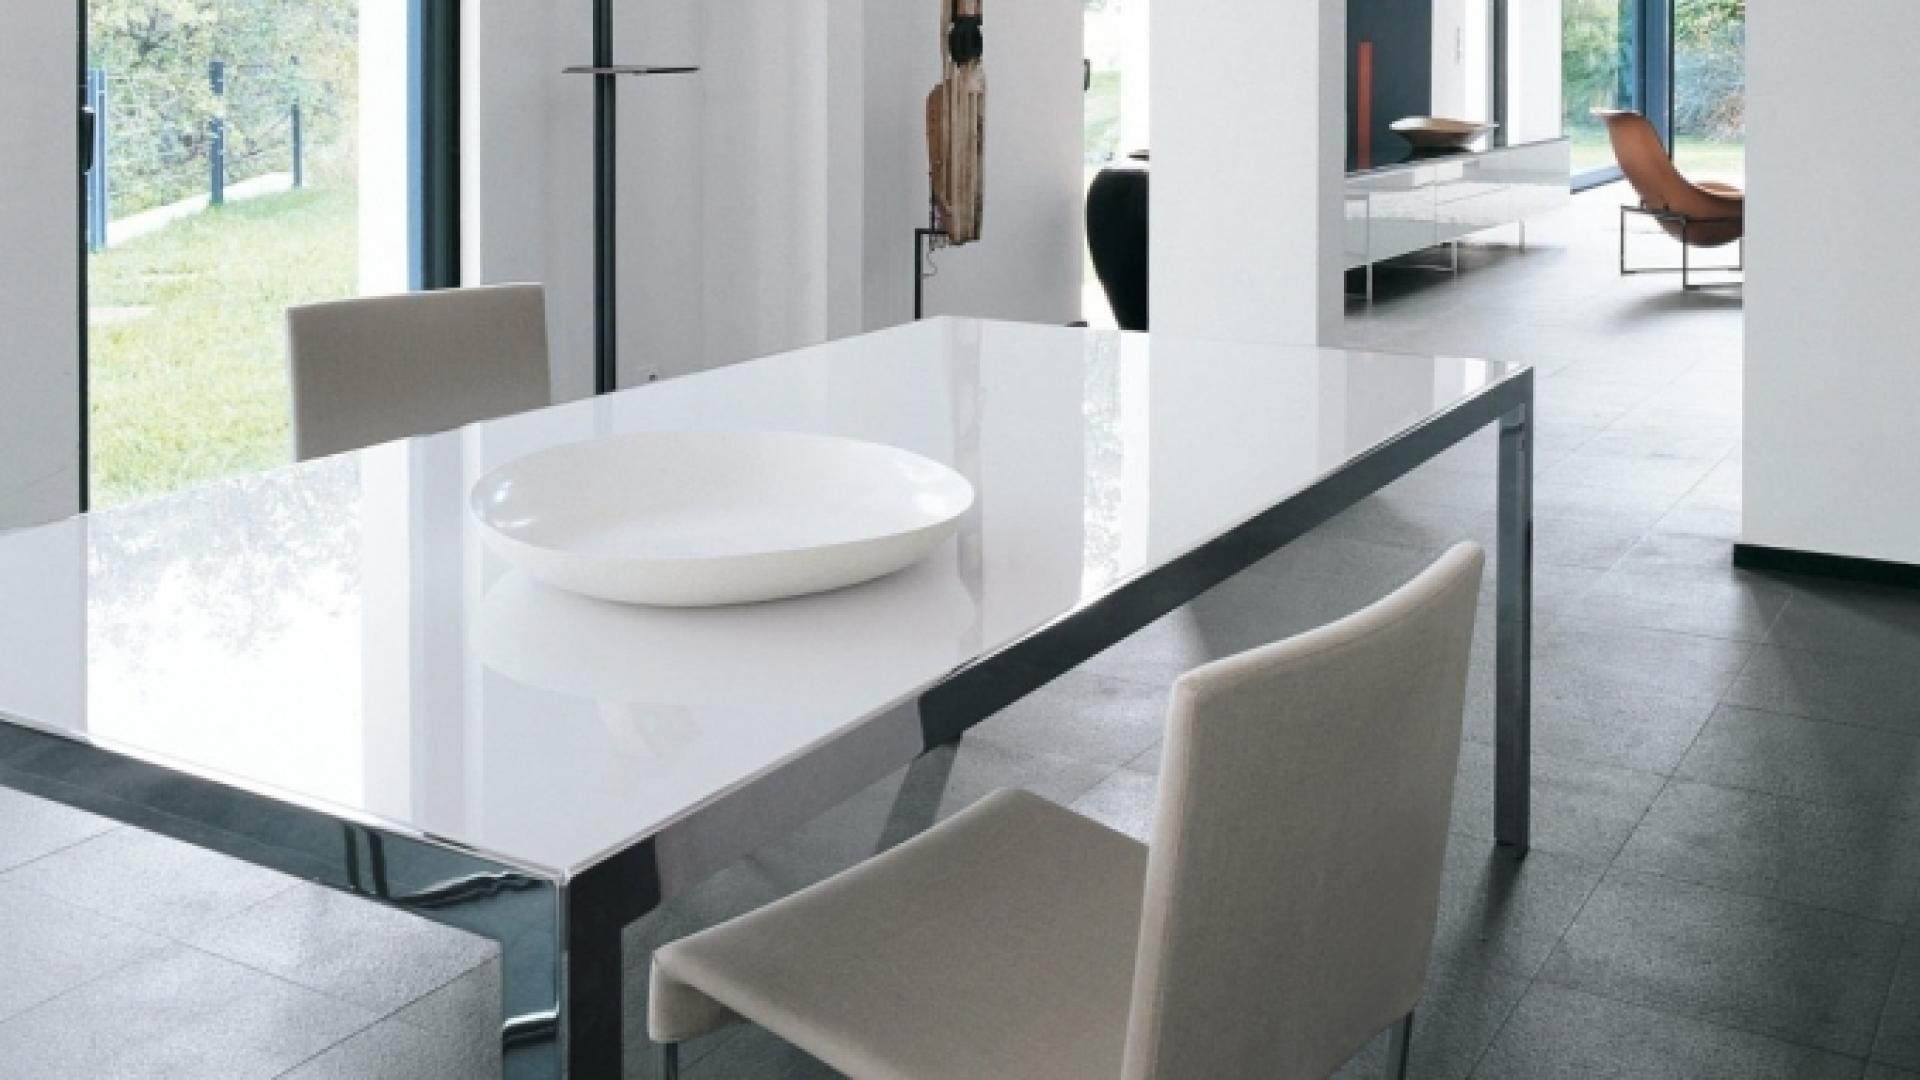 big-01-BEB_ITALIA-THE_TABLE-BIG-01-THE-TABLE.jpg